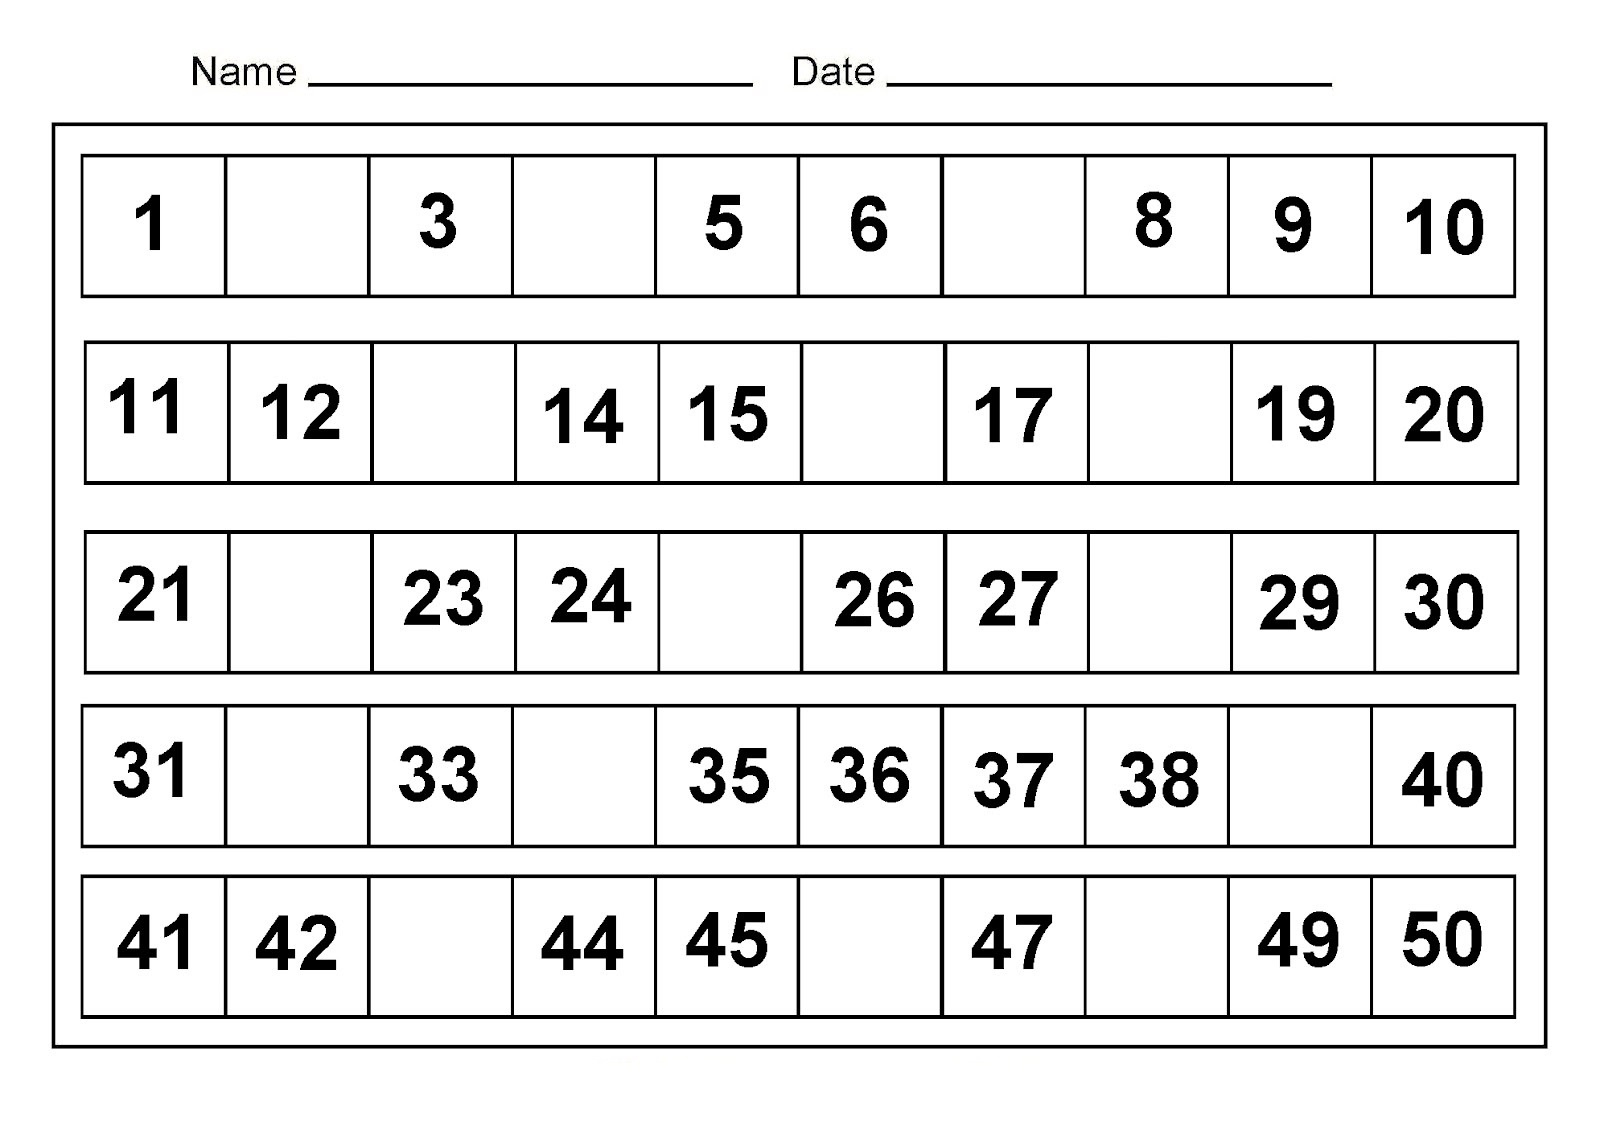 Free Printable Educational Worksheets Pdf | Activity Shelter - Free Printable Worksheets